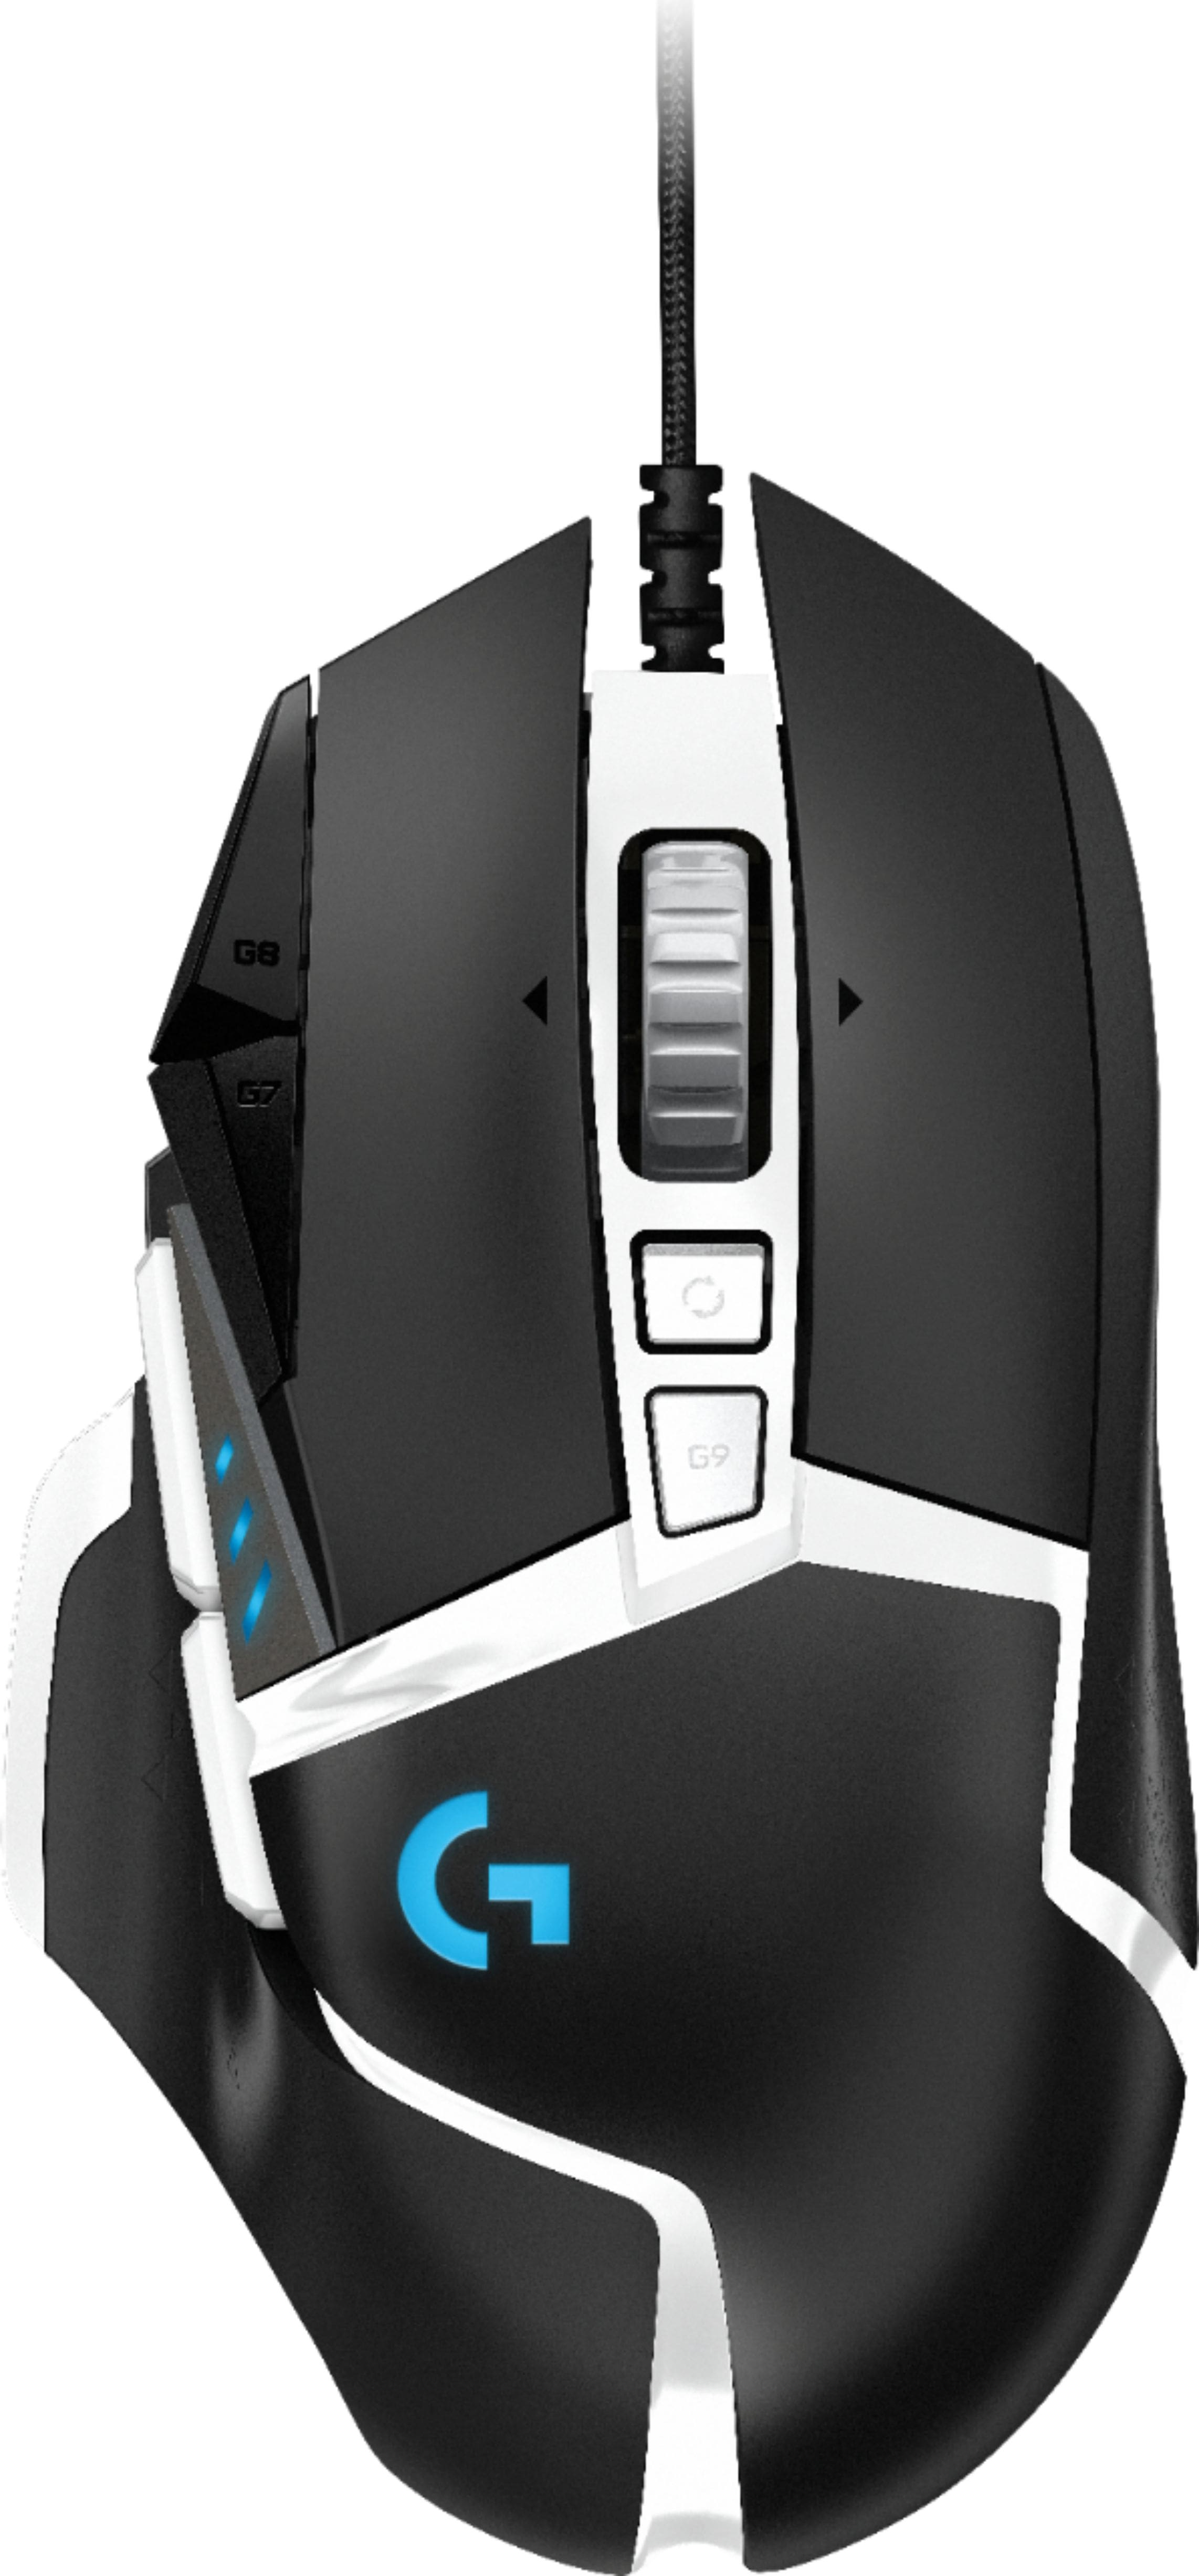 Logitech G502 HERO SE Wired Optical Gaming Mouse w/ RGB Lighting $29.99 + In-store pickup @ BestBuy